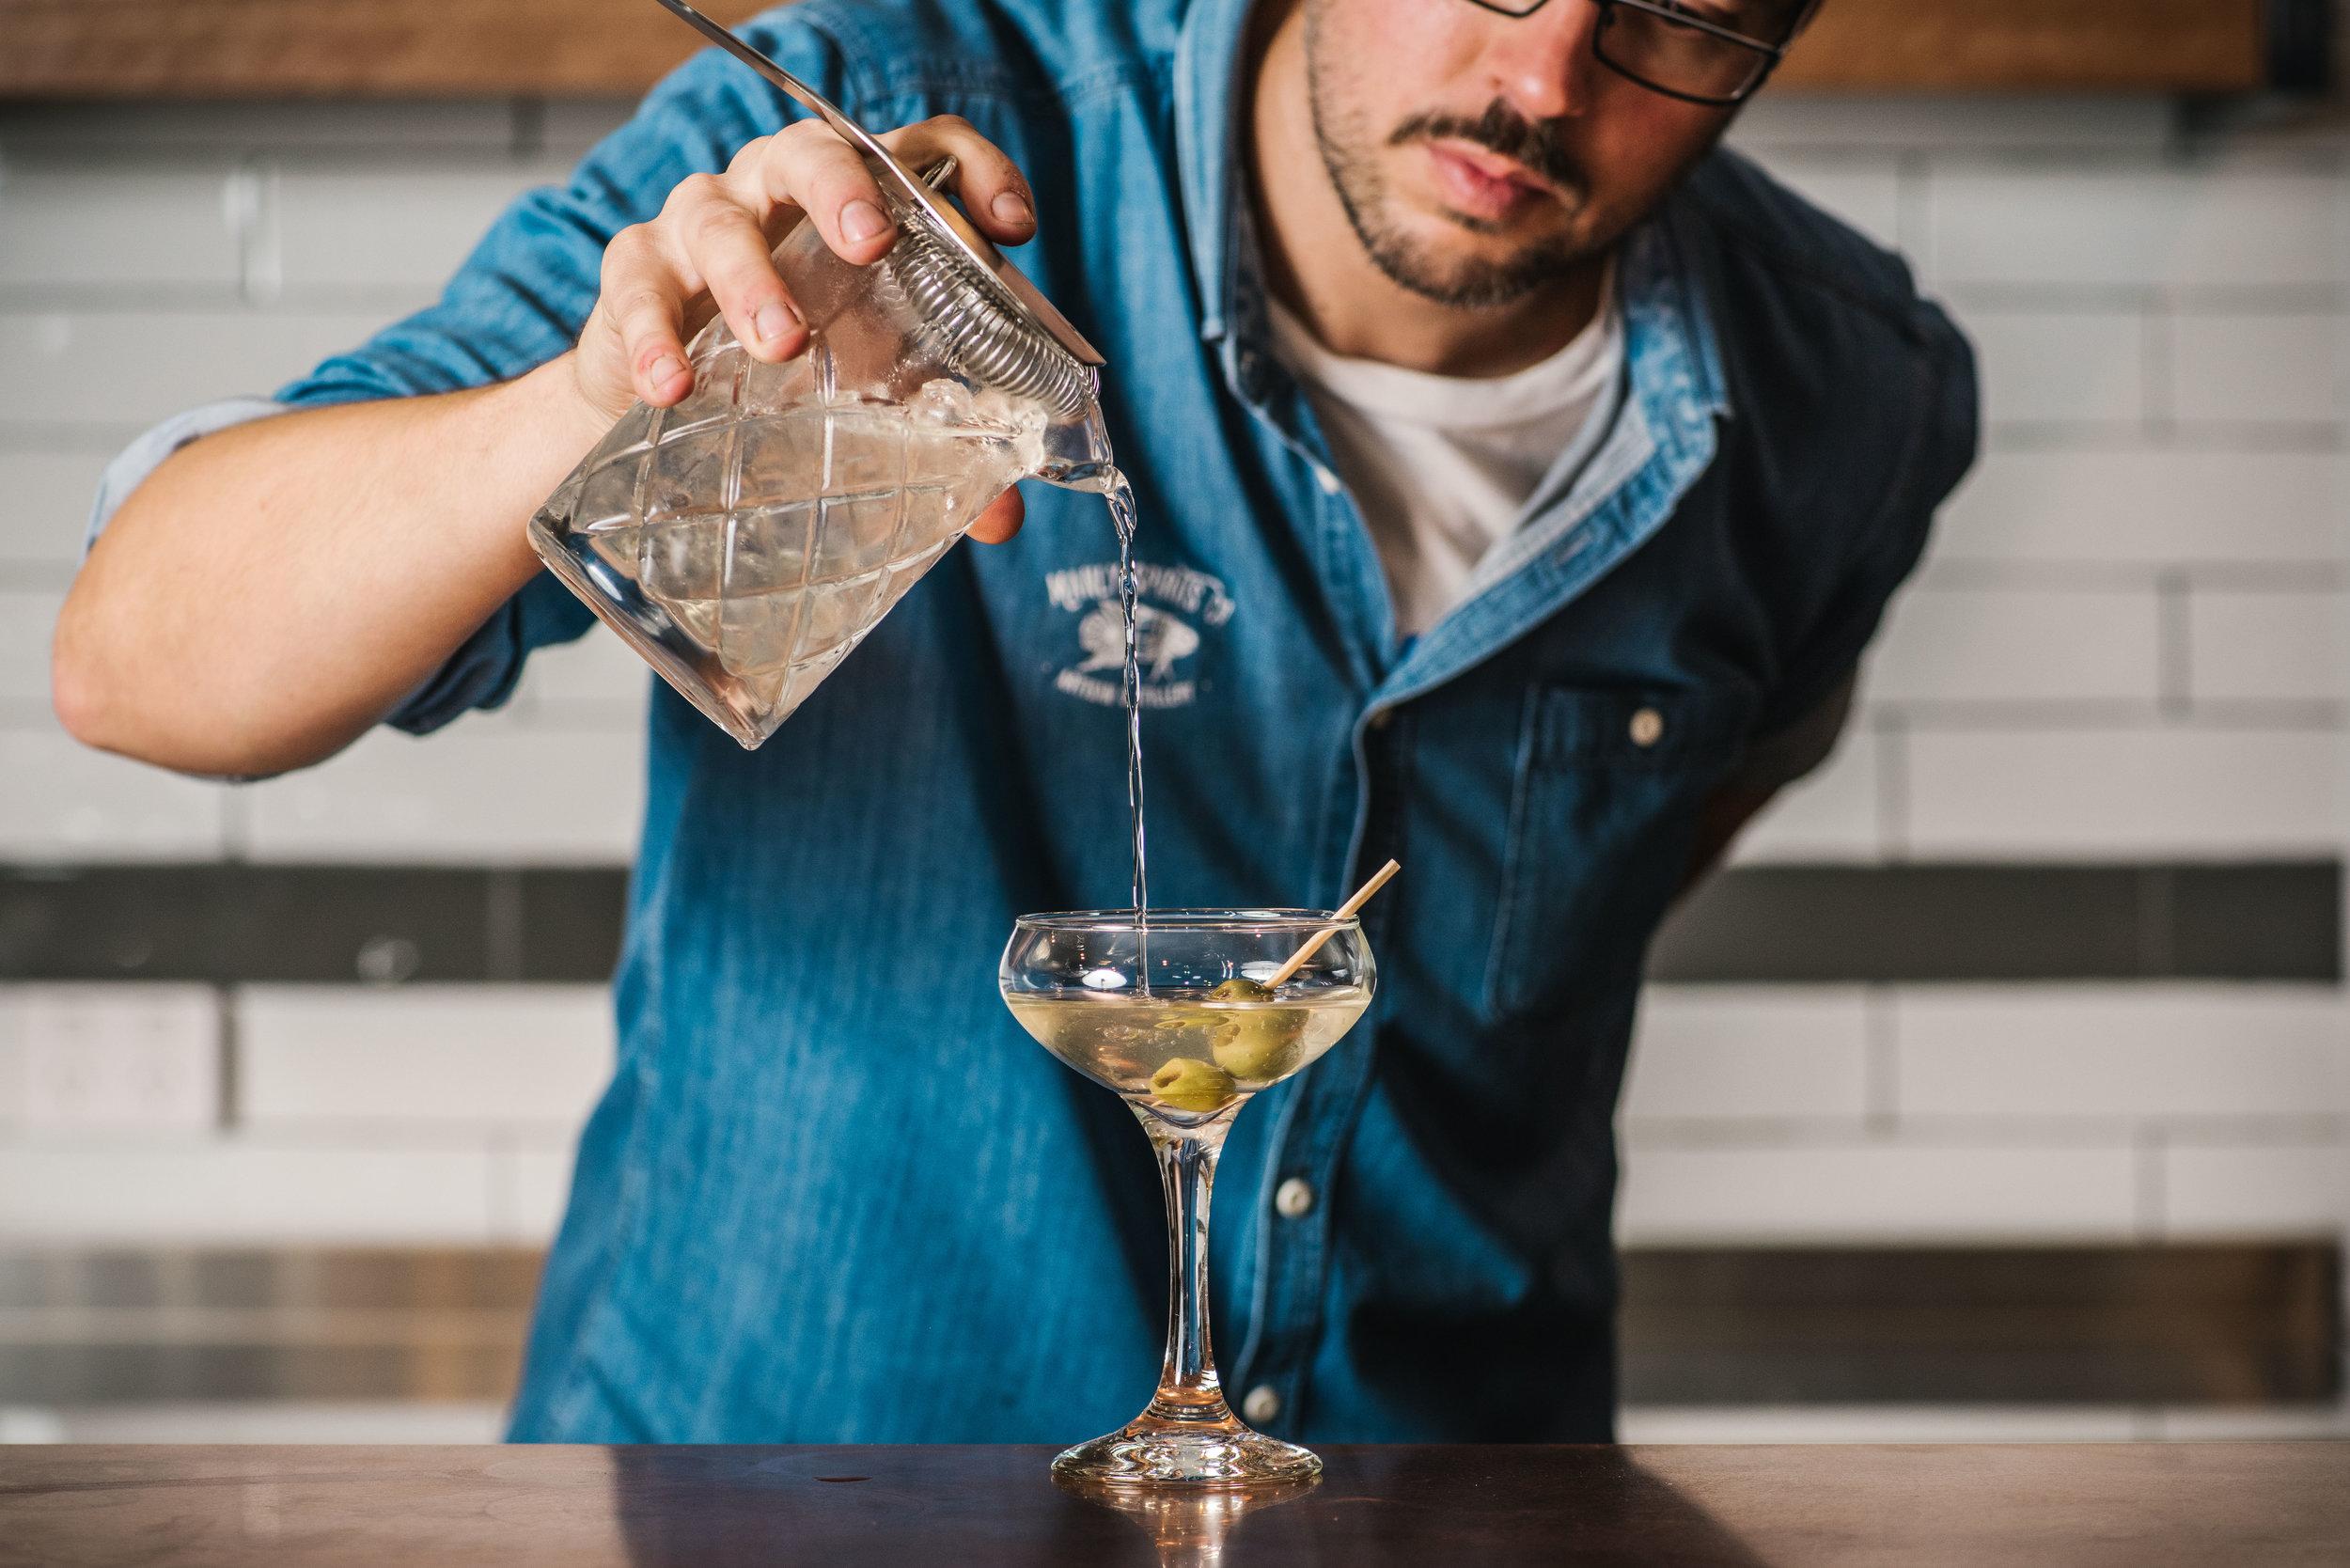 Manly Spirits Marine Botanical Vodka Dirty Martini 2. Image Alana Dimou.jpeg